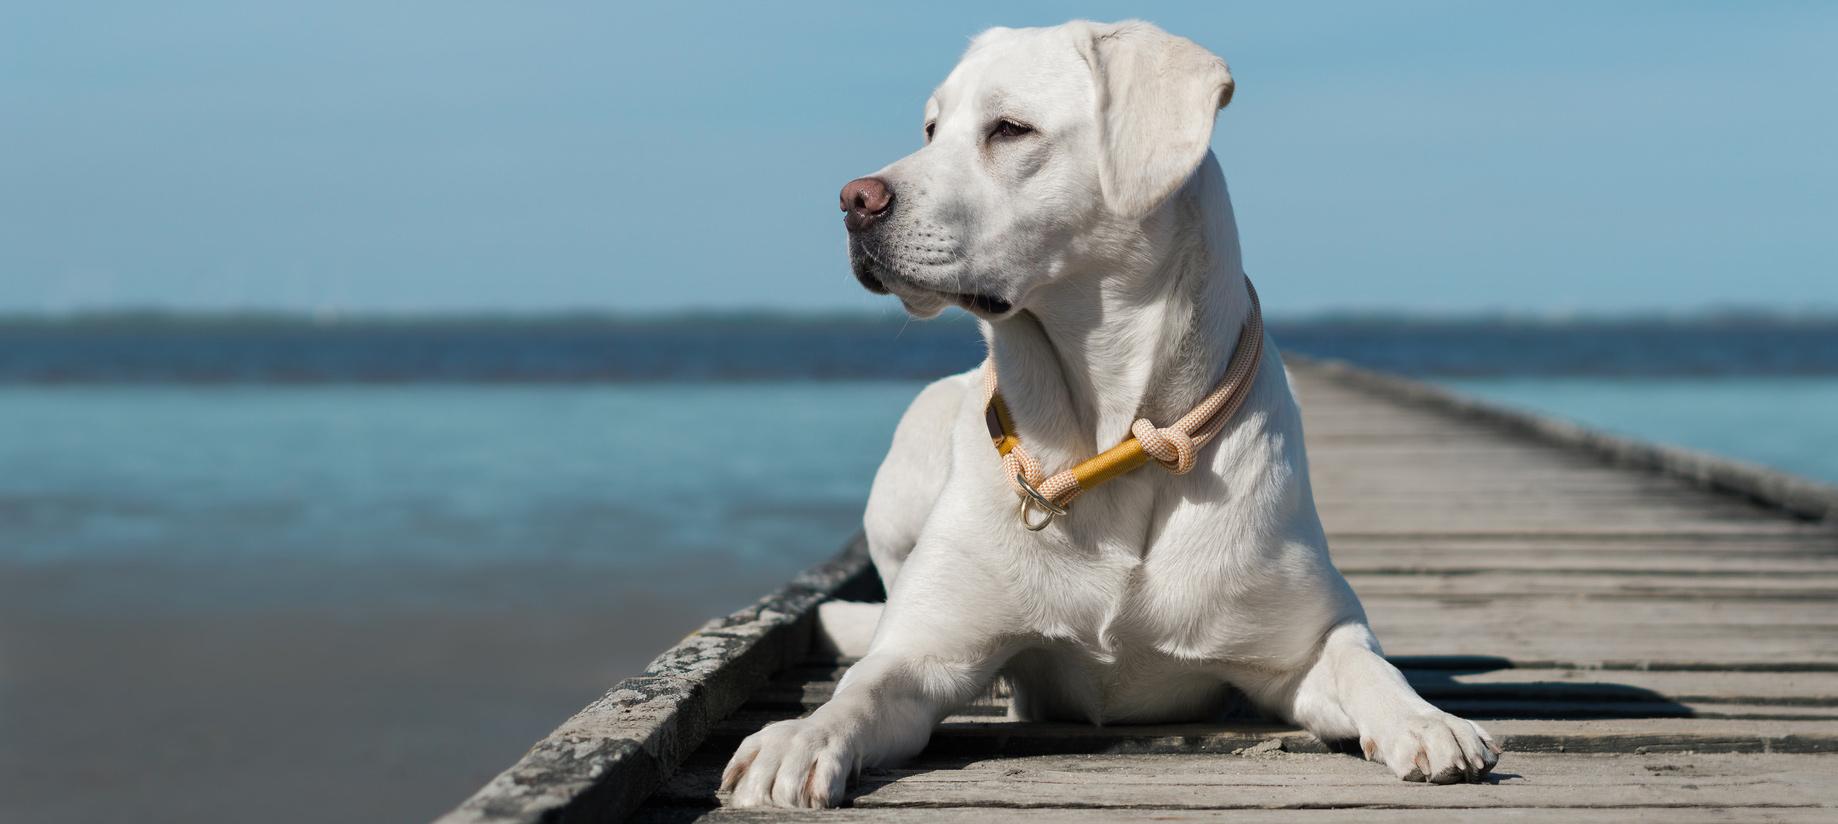 Weißer Labrador am Meer